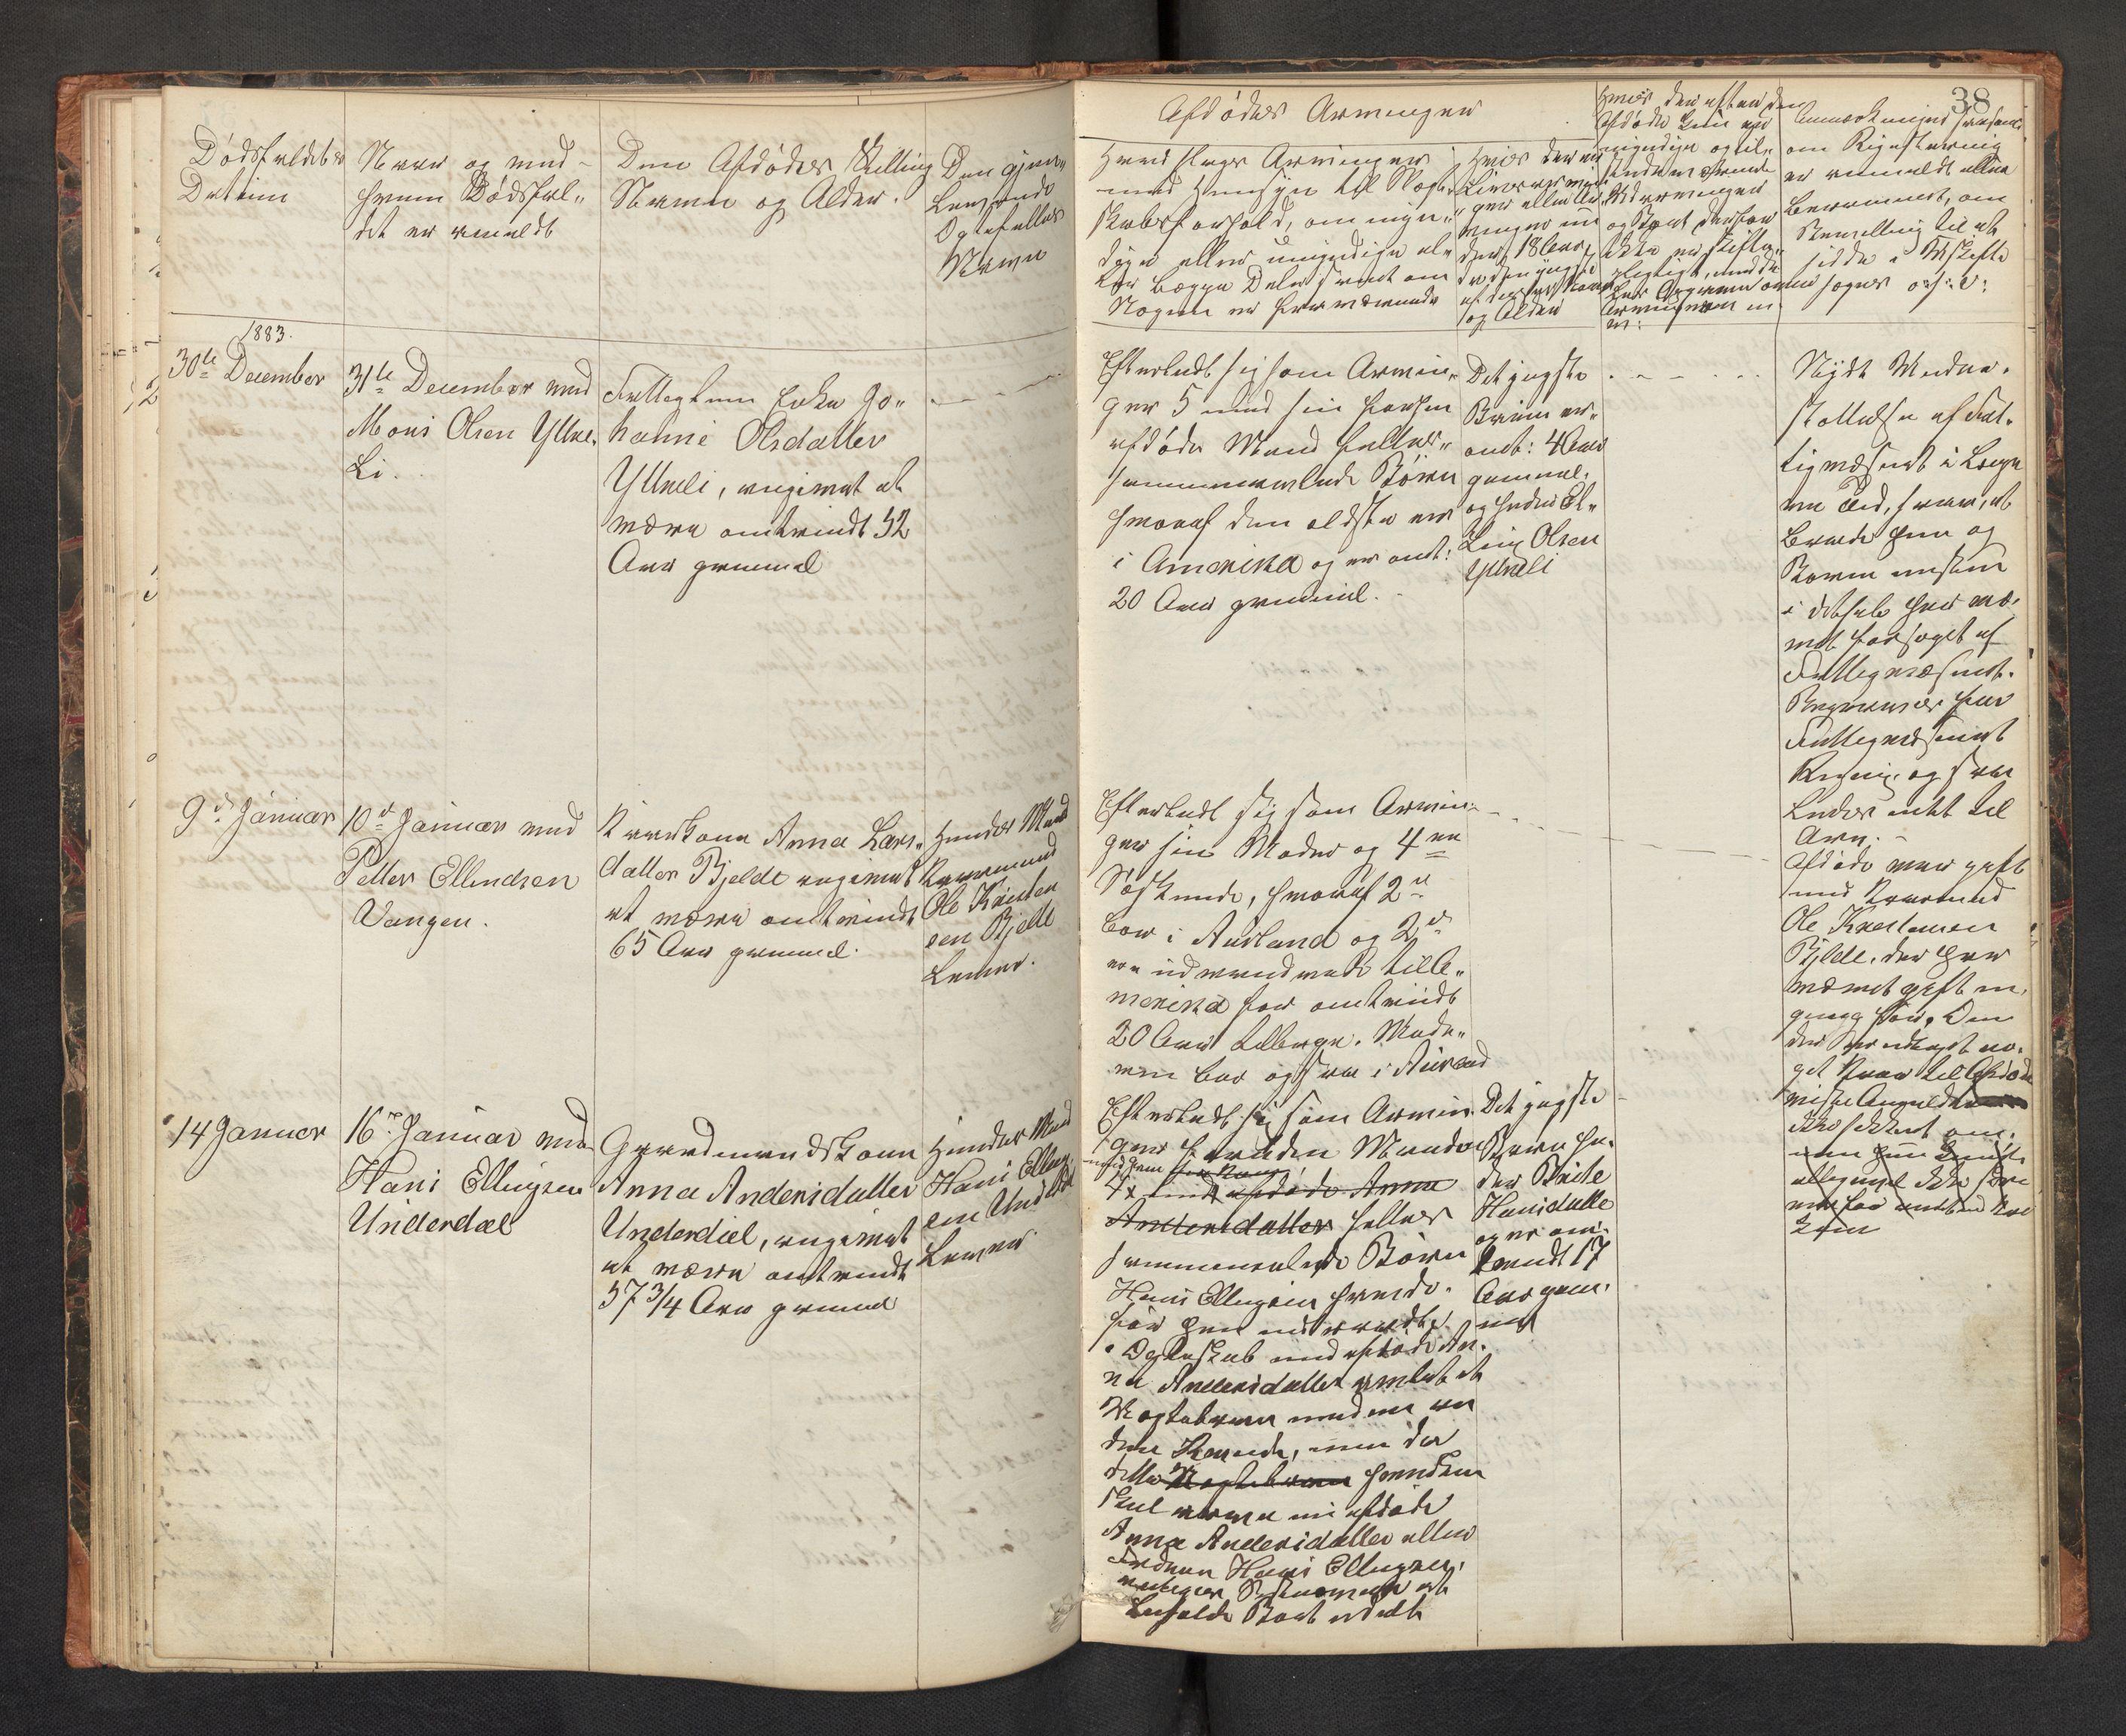 SAB, Lensmannen i Aurland, 0006/L0002: Dødsfallprotokoll, 1877-1892, s. 37b-38a